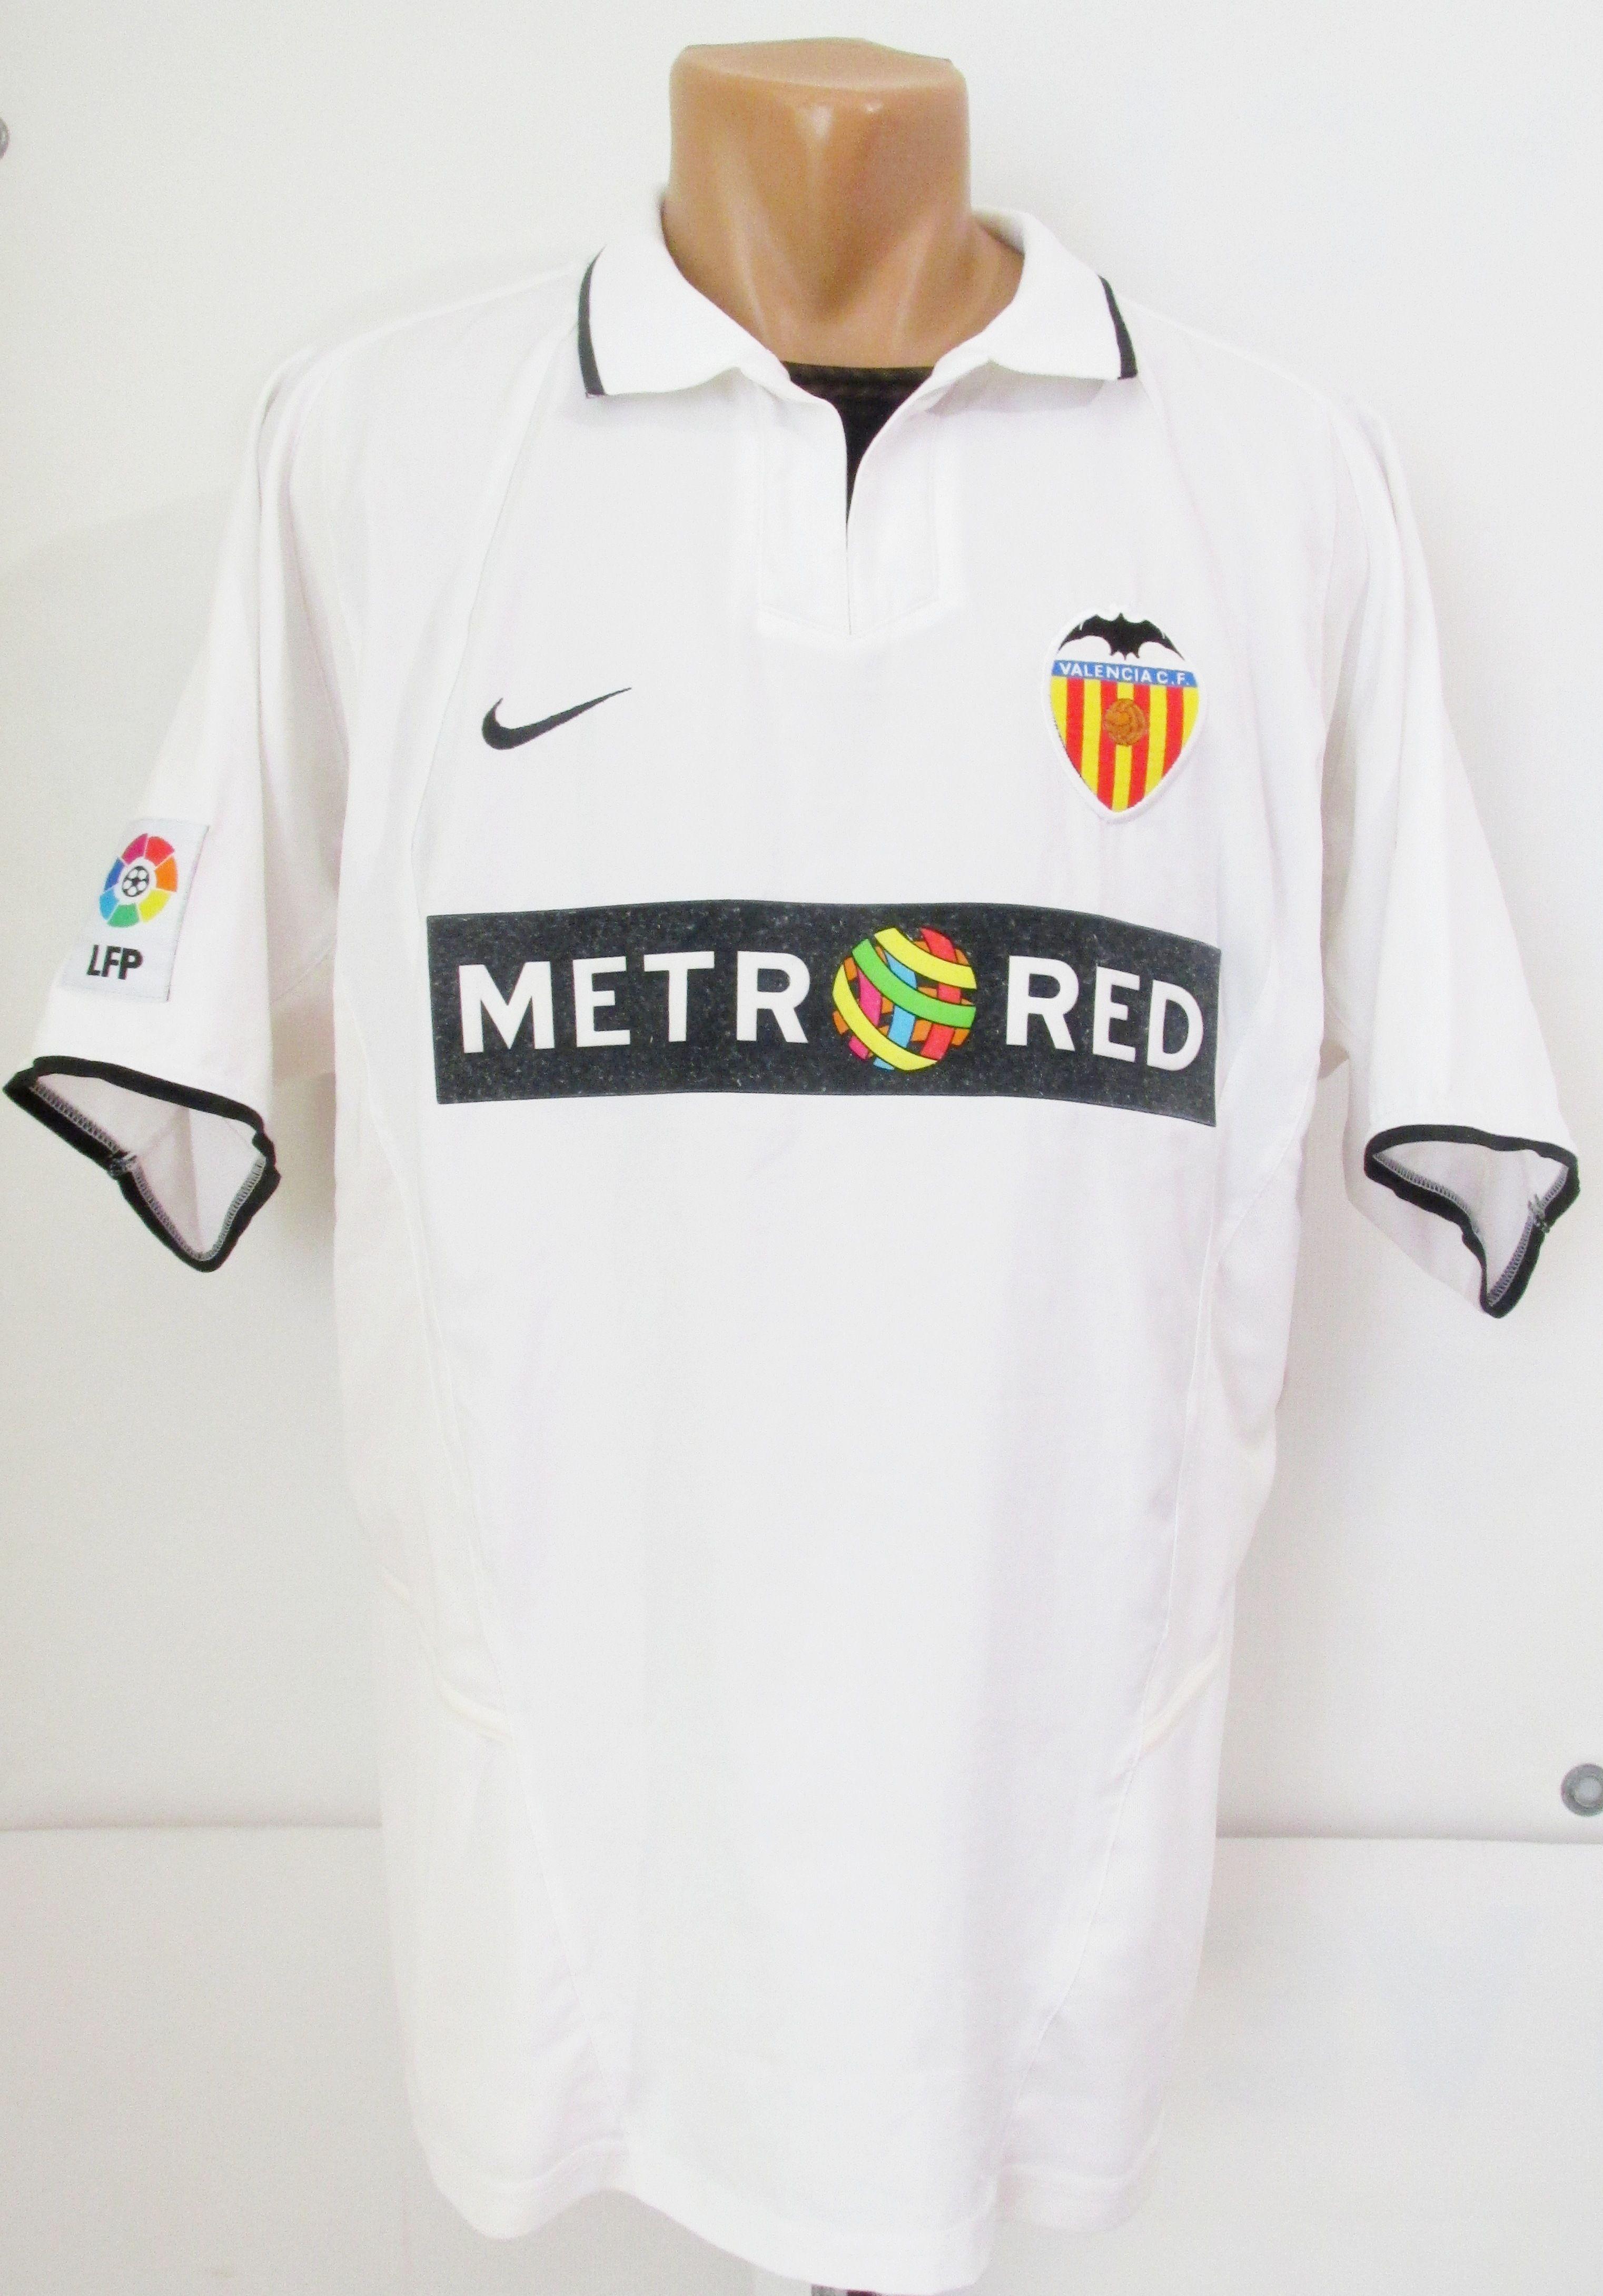 618b75e14 Valencia CF 2002 2003 home football shirt by Nike VCF Spain LaLiga vintage  soccer camiseta jersey  Valencia  ValenciaCF  VCF  Spain  LaLiga  Nike   camiseta ...